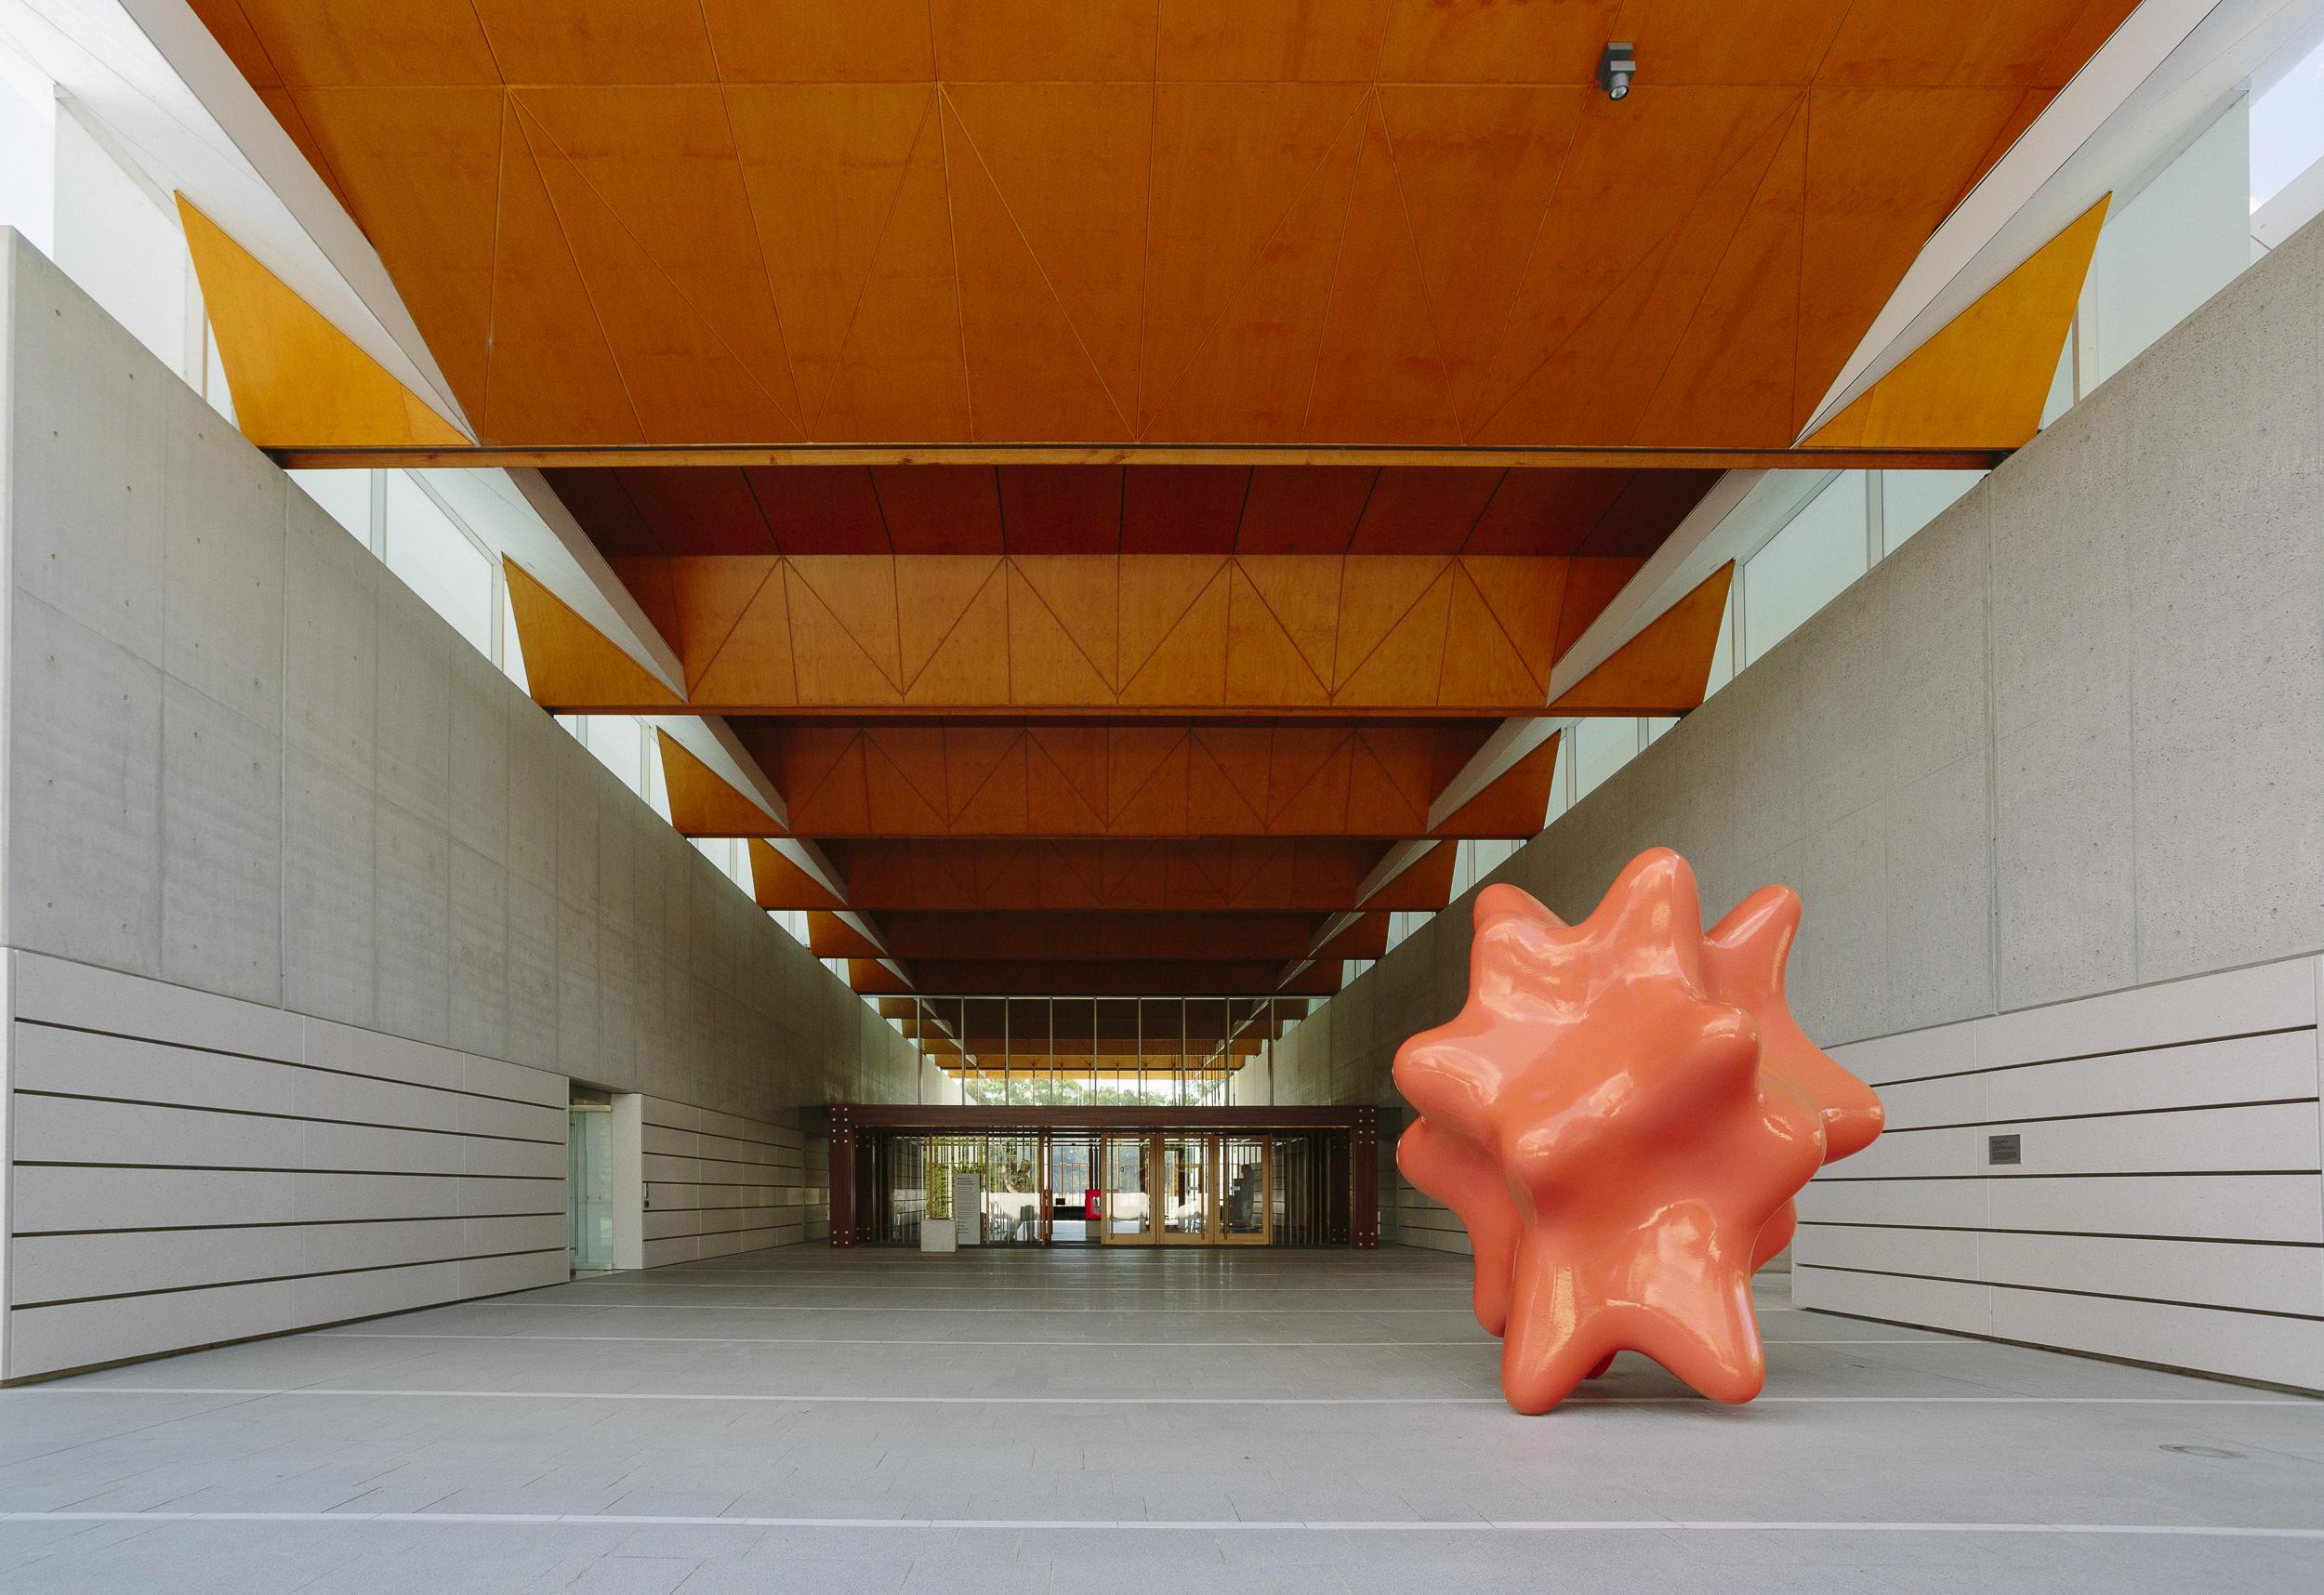 Canberra_Portrait Gallery_12.jpg